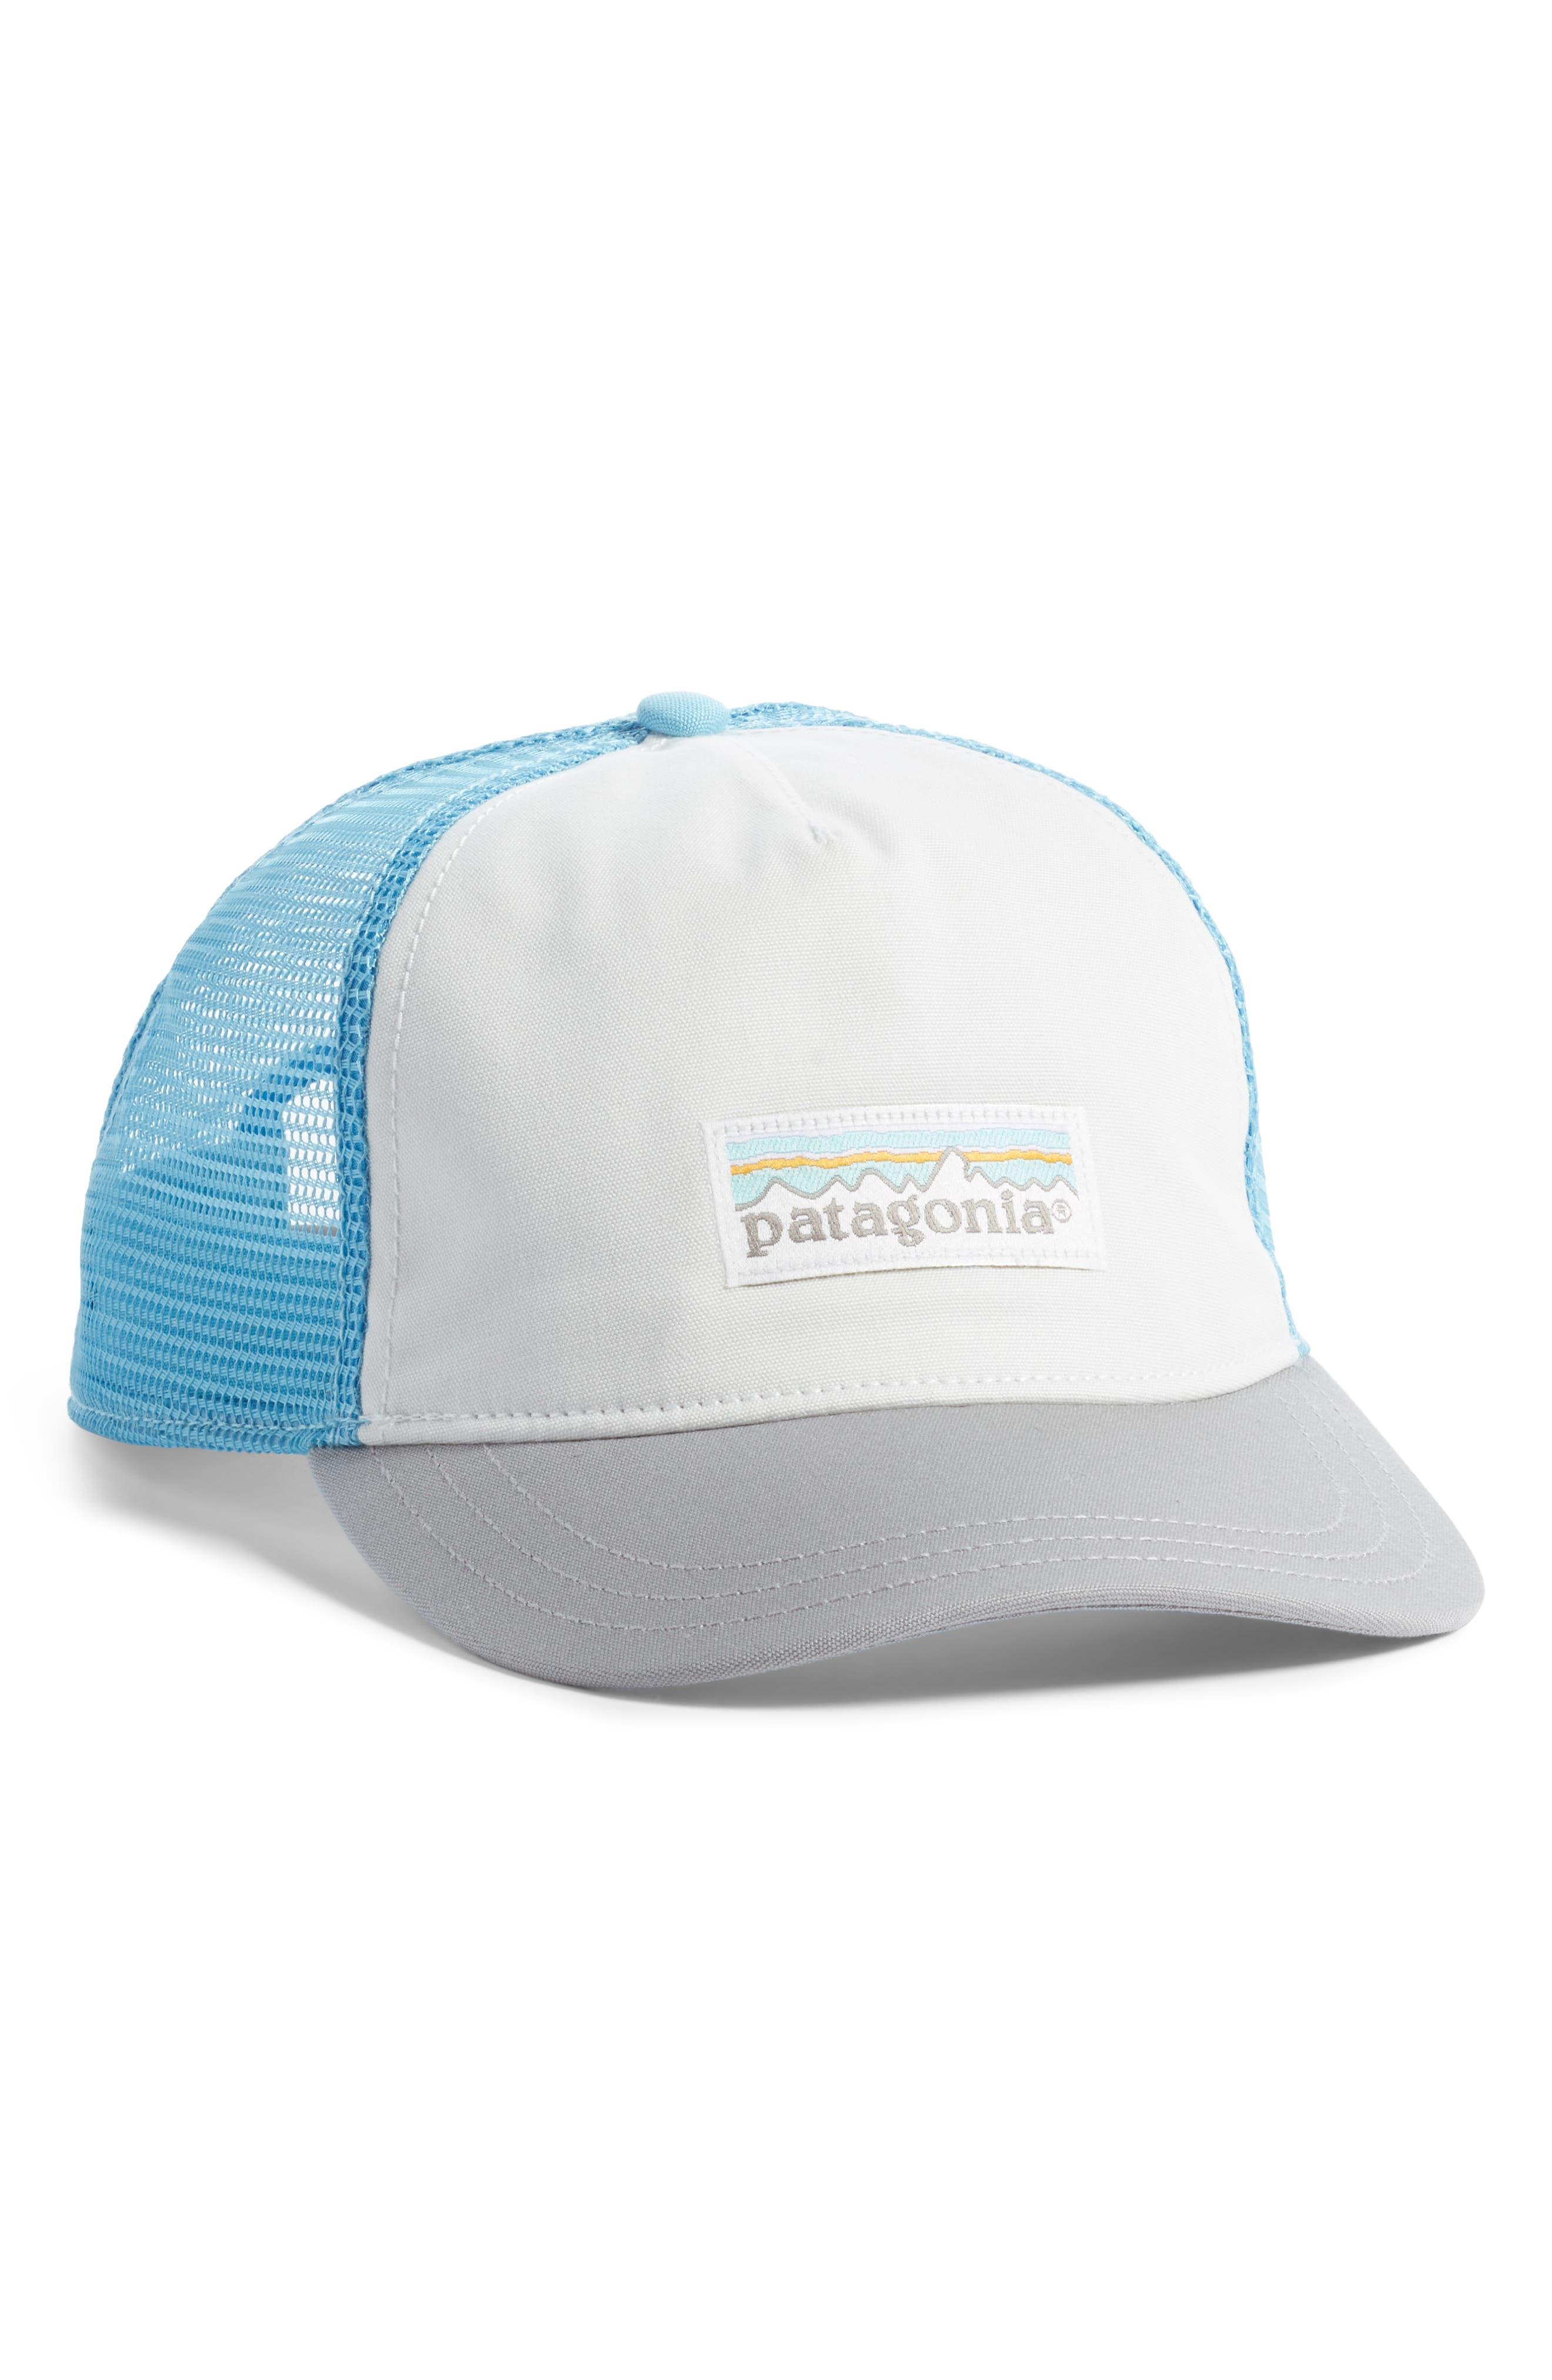 088db836fba Women s Hats New Arrivals  Clothing